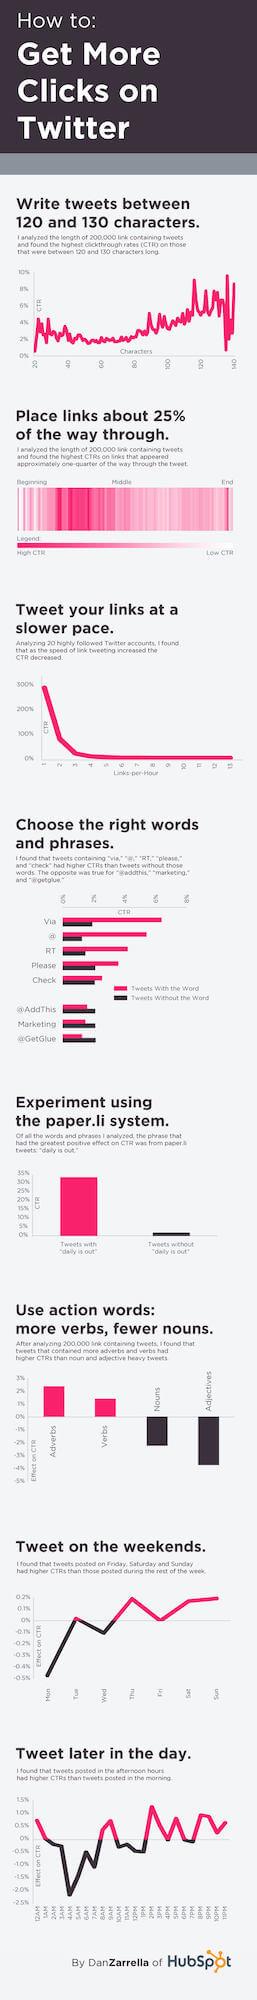 ctr infographic